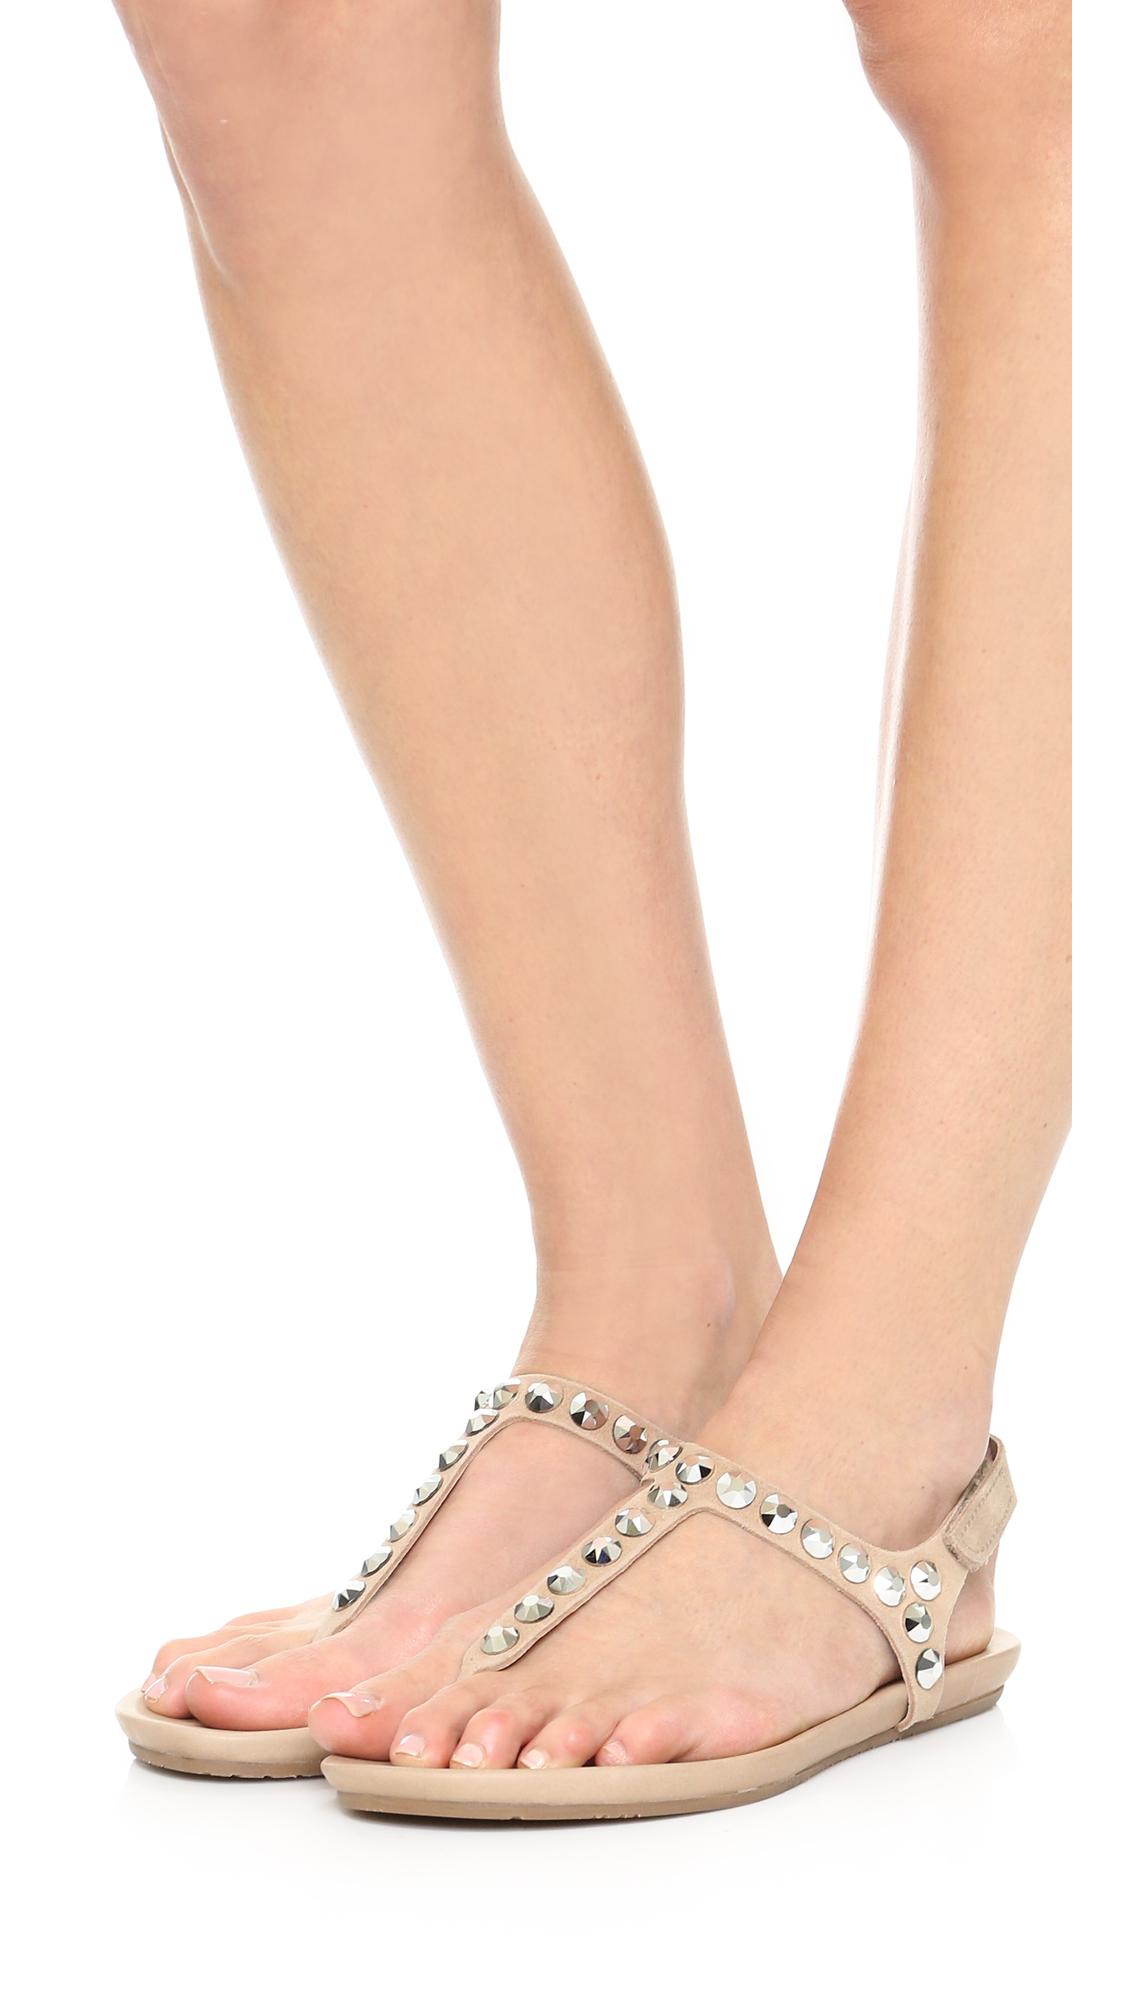 6281b873e32fd1 Lyst - Pedro Garcia Judith Embellished Sandals in Natural